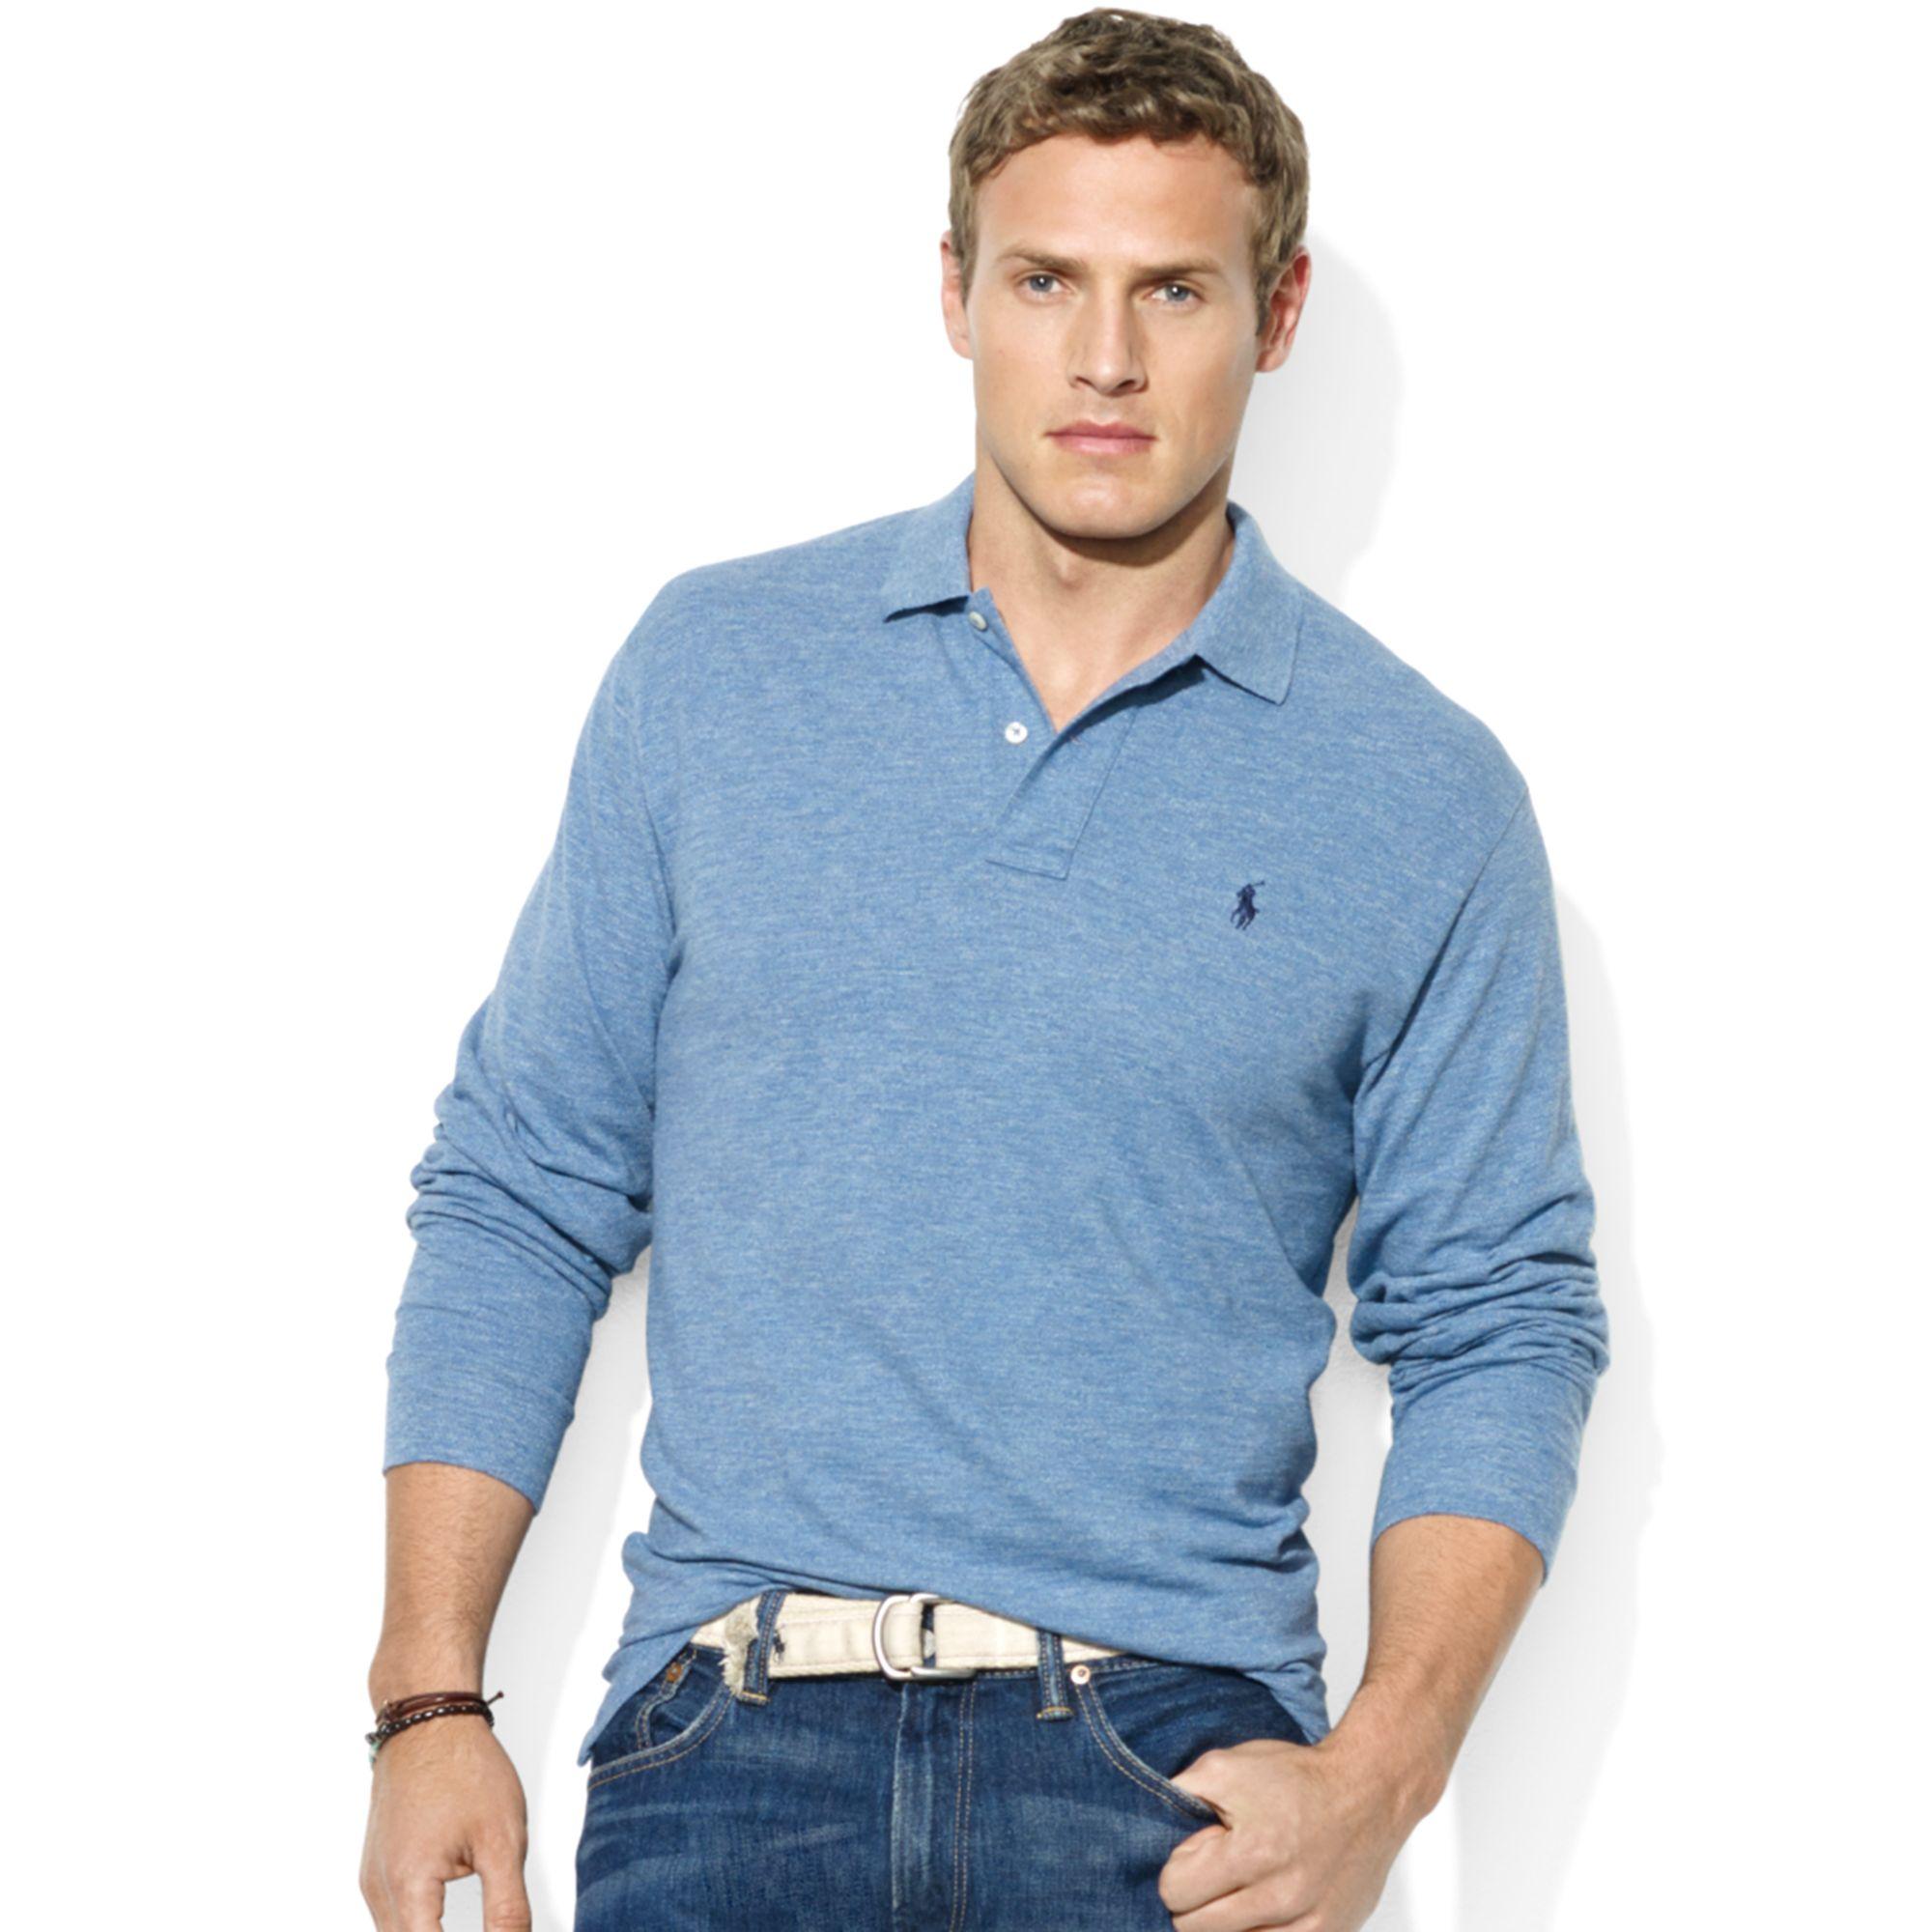 Lyst - Ralph Lauren Classicfit Longsleeve Cotton Mesh Polo in Blue ... cdb9e6d2720f